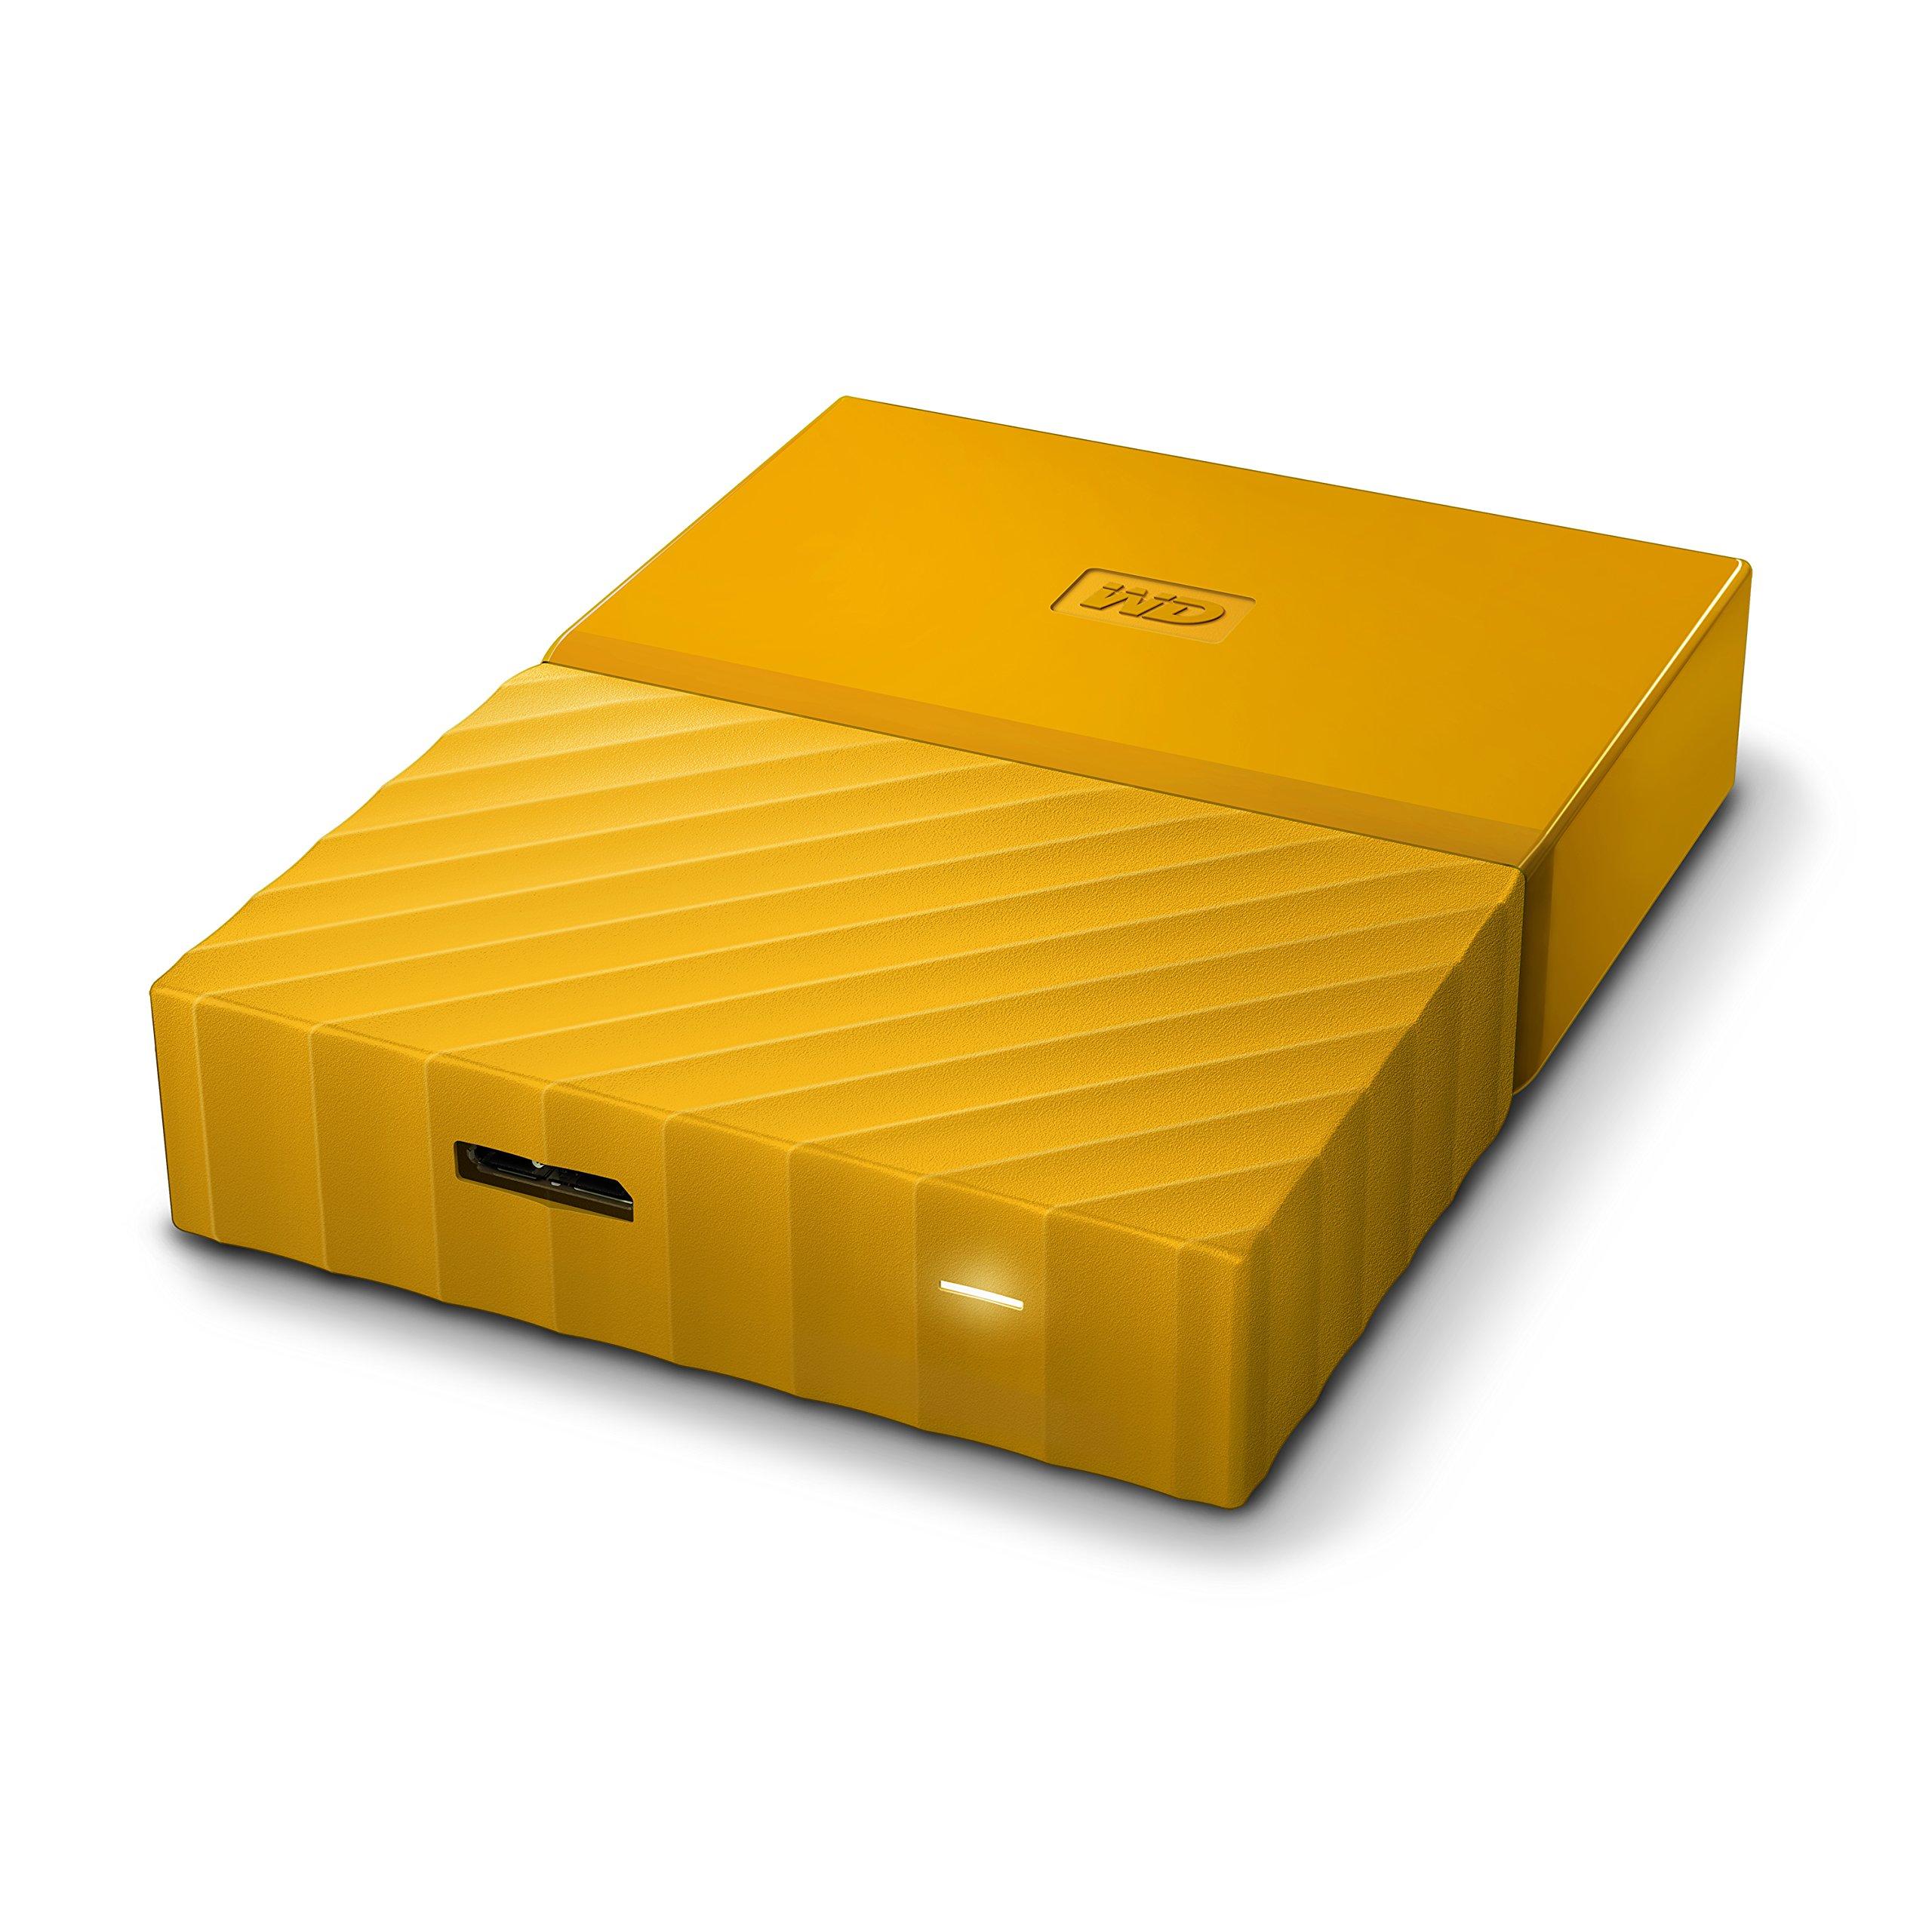 WD 2TB Yellow My Passport Portable External Hard Drive - USB 3.0 - WDBYFT0020BYL-WESN by Western Digital (Image #6)